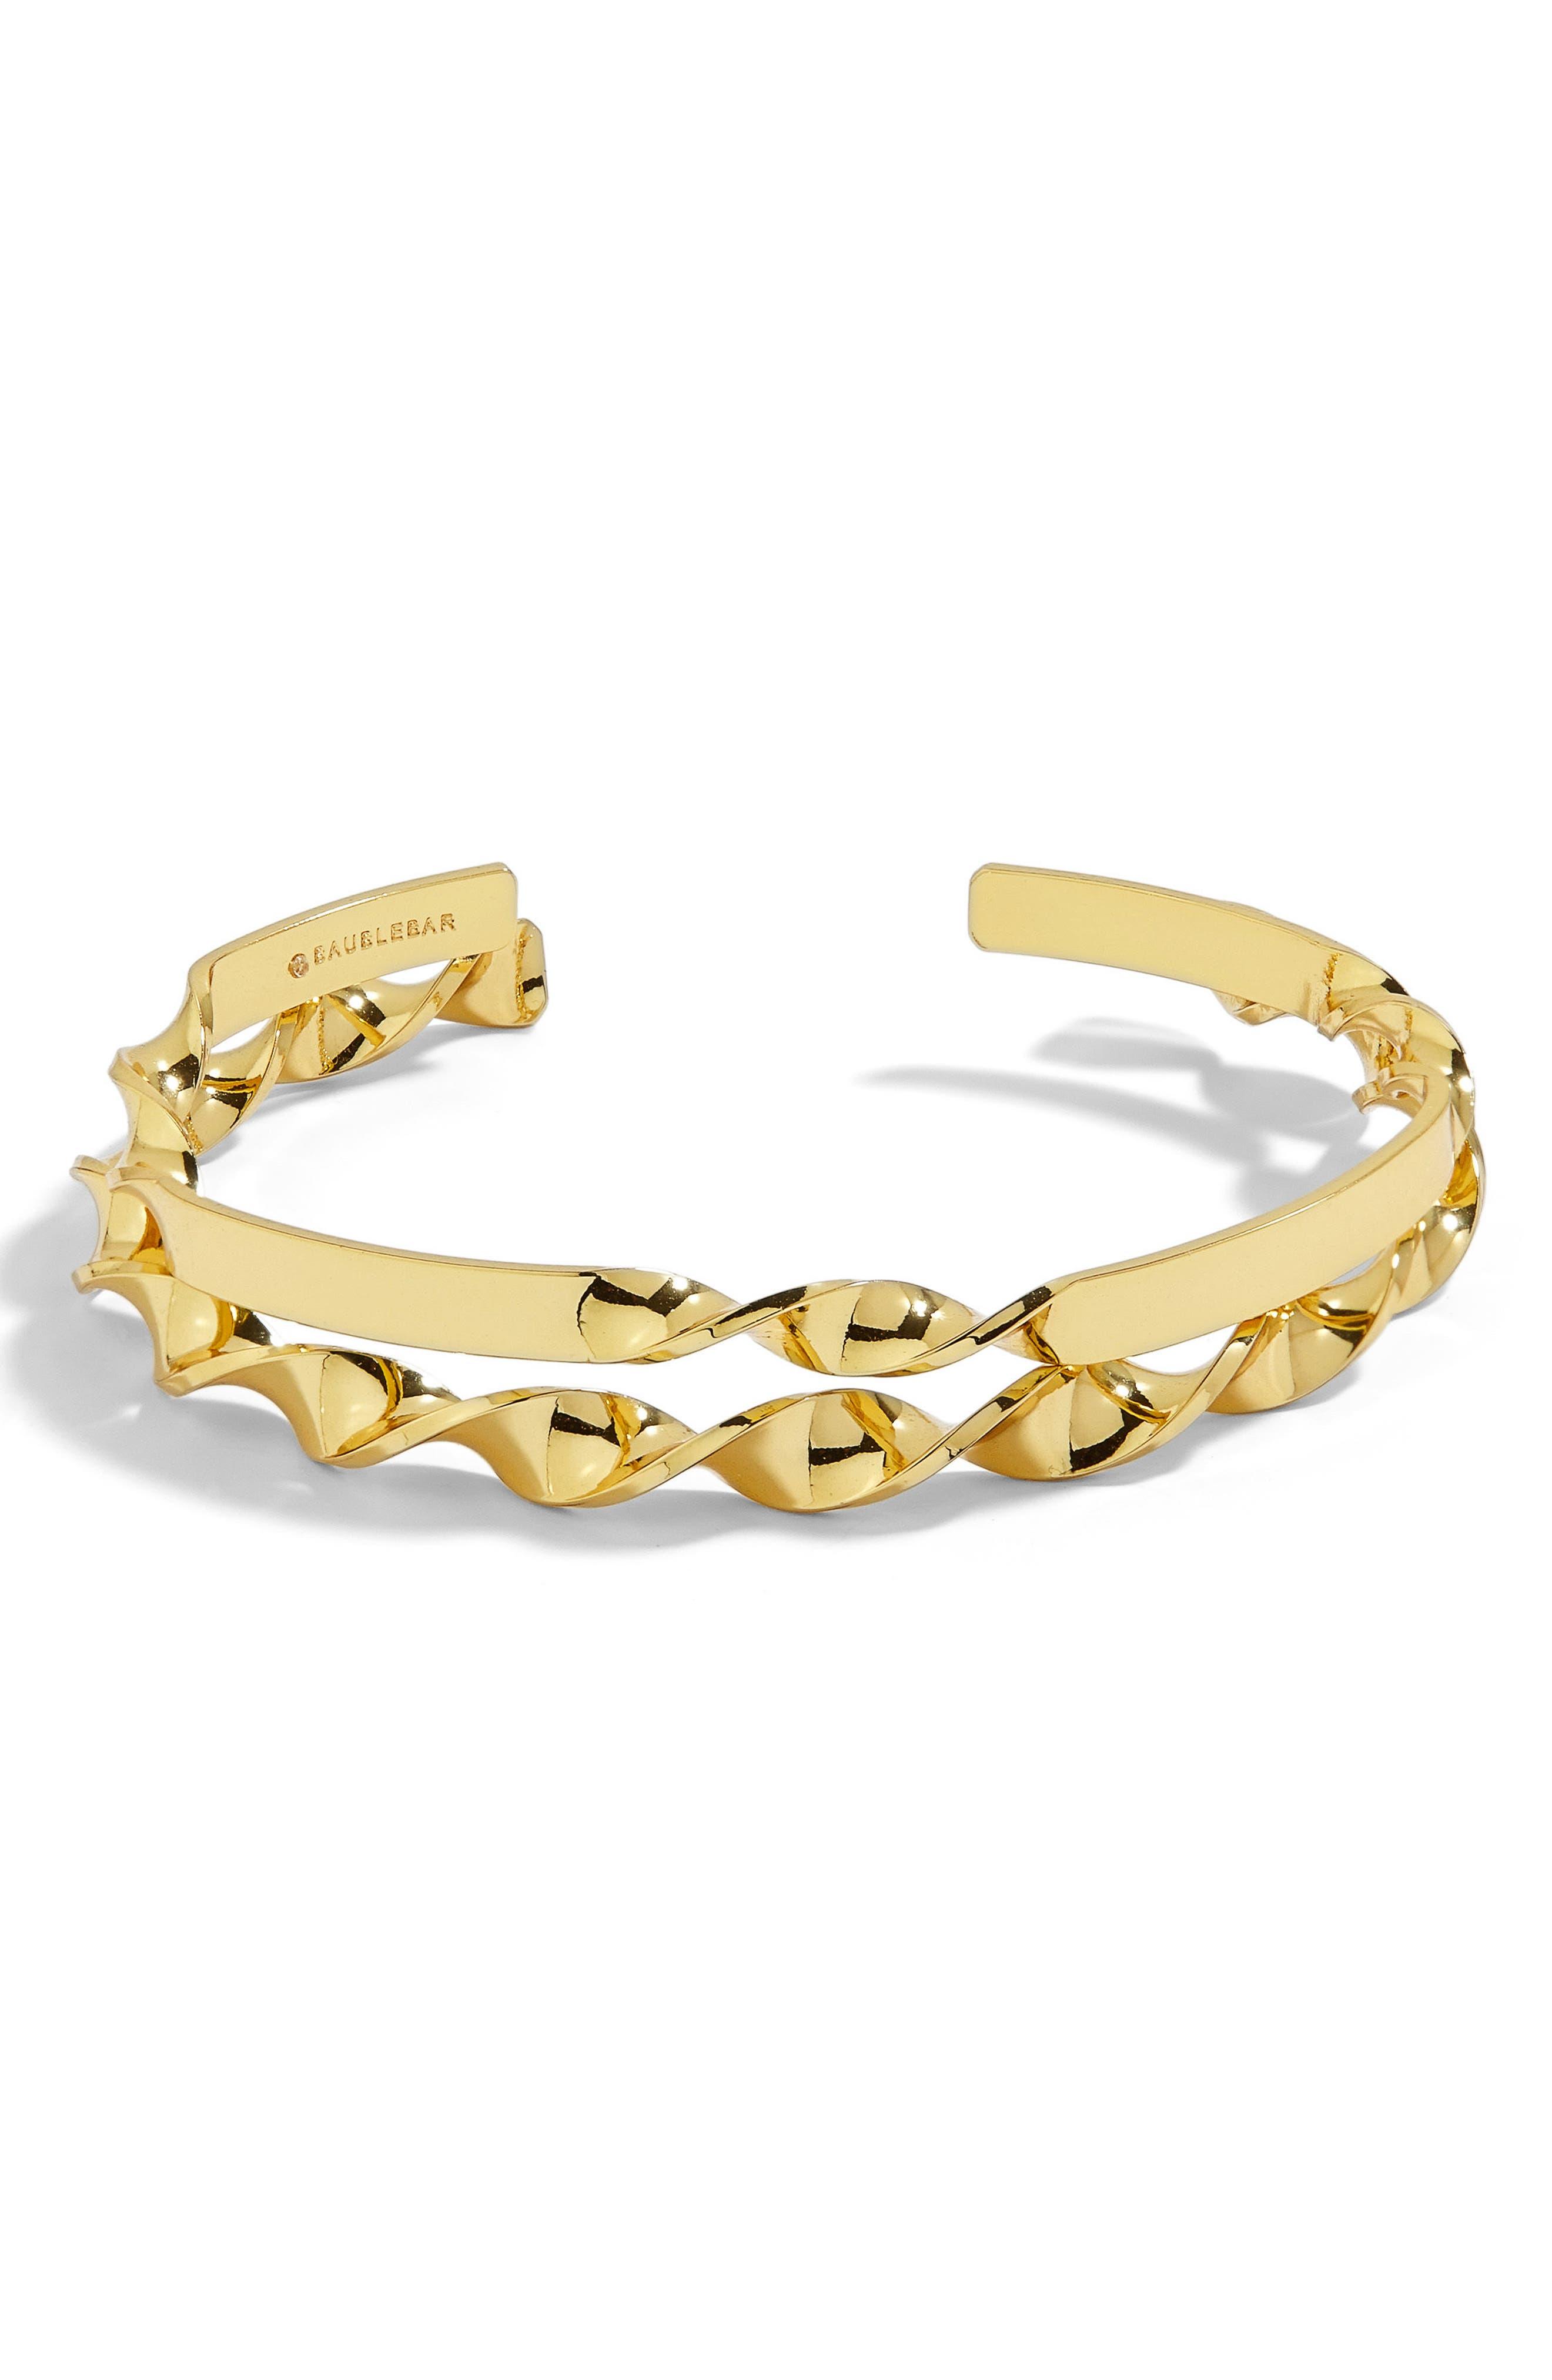 BAUBLEBAR Narine Set of 2 Twisted Gold Cuff Bracelets, Main, color, 710